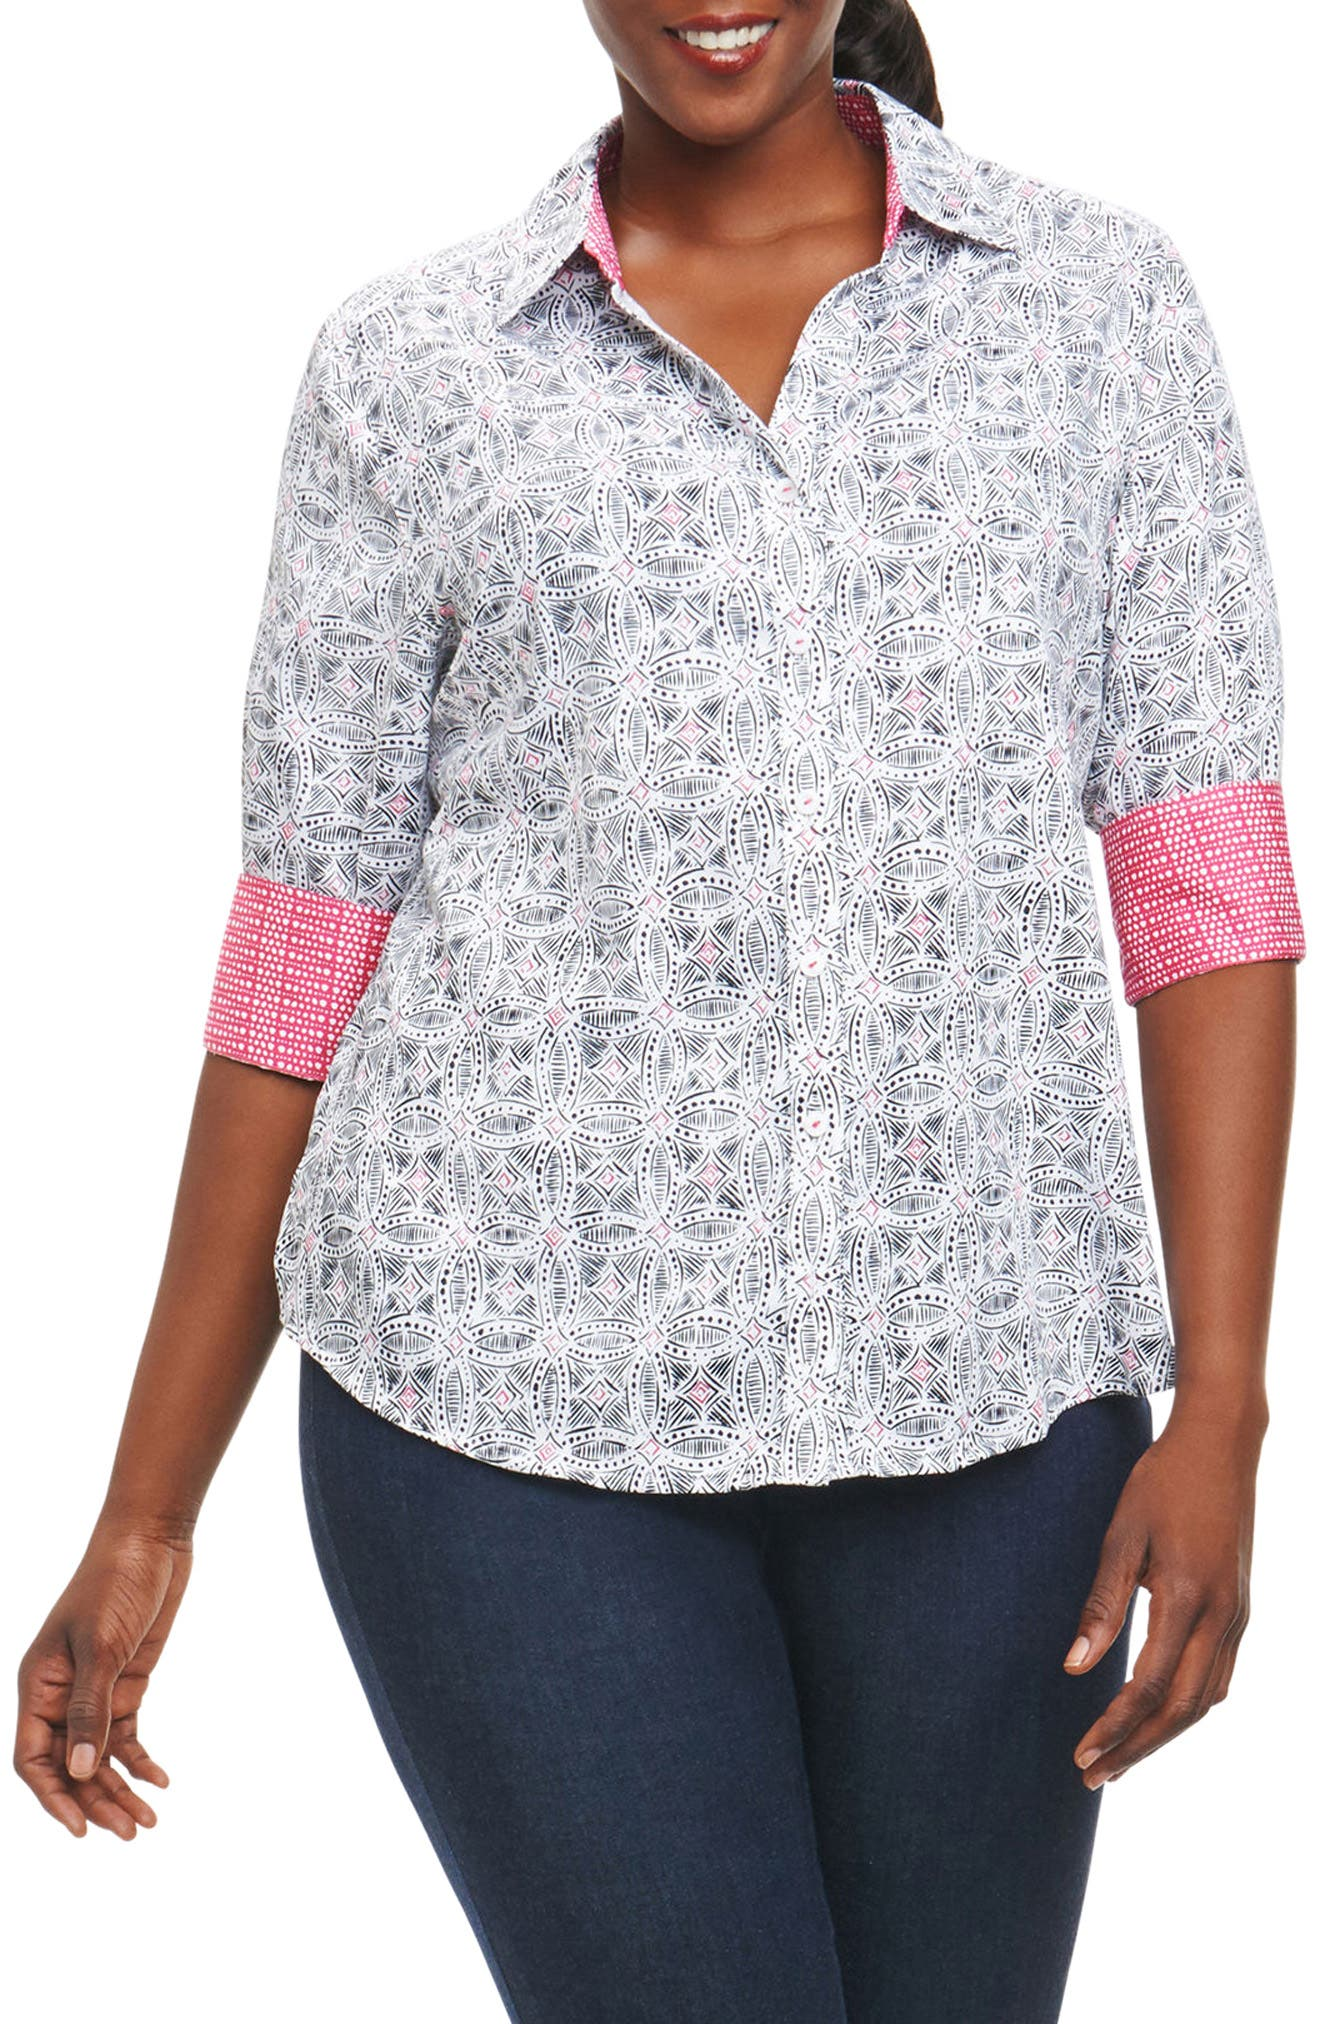 Alternate Image 1 Selected - Foxcroft Mary Circle Tile Print Shirt (Plus Size)